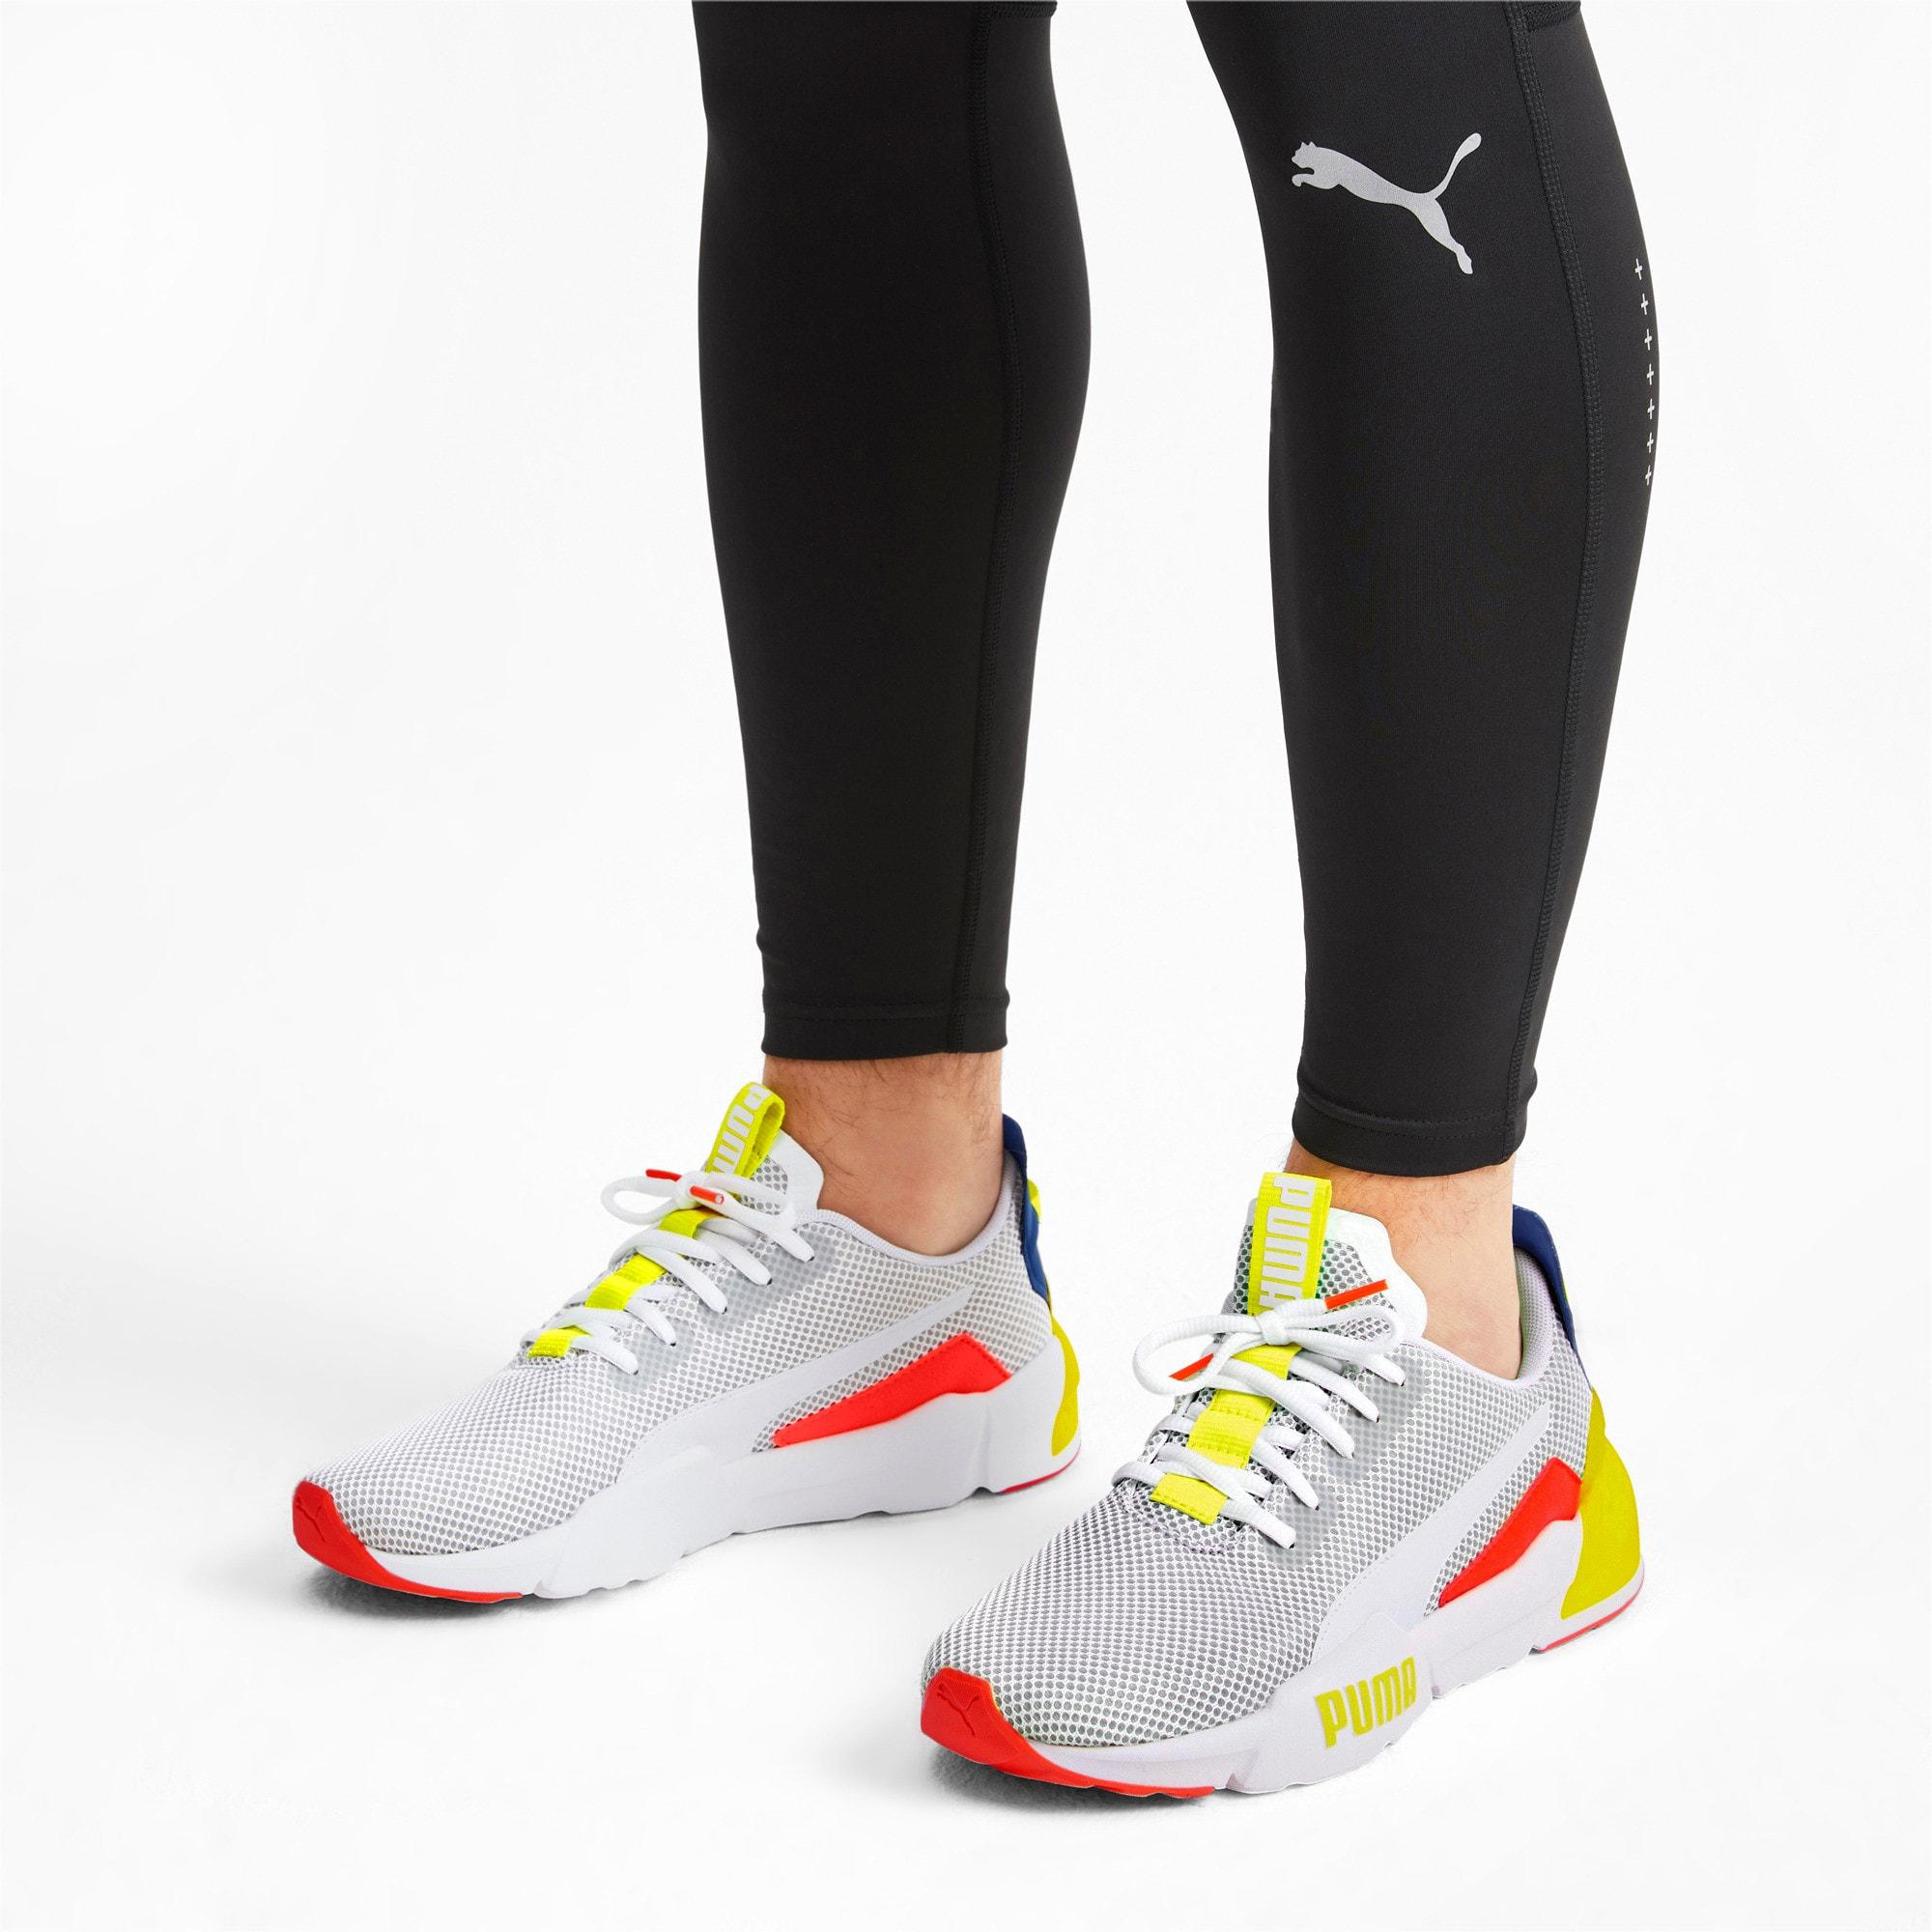 Thumbnail 3 of CELL Phase Men's Training Shoes, White-GalaxyBlue-YellowAlert, medium